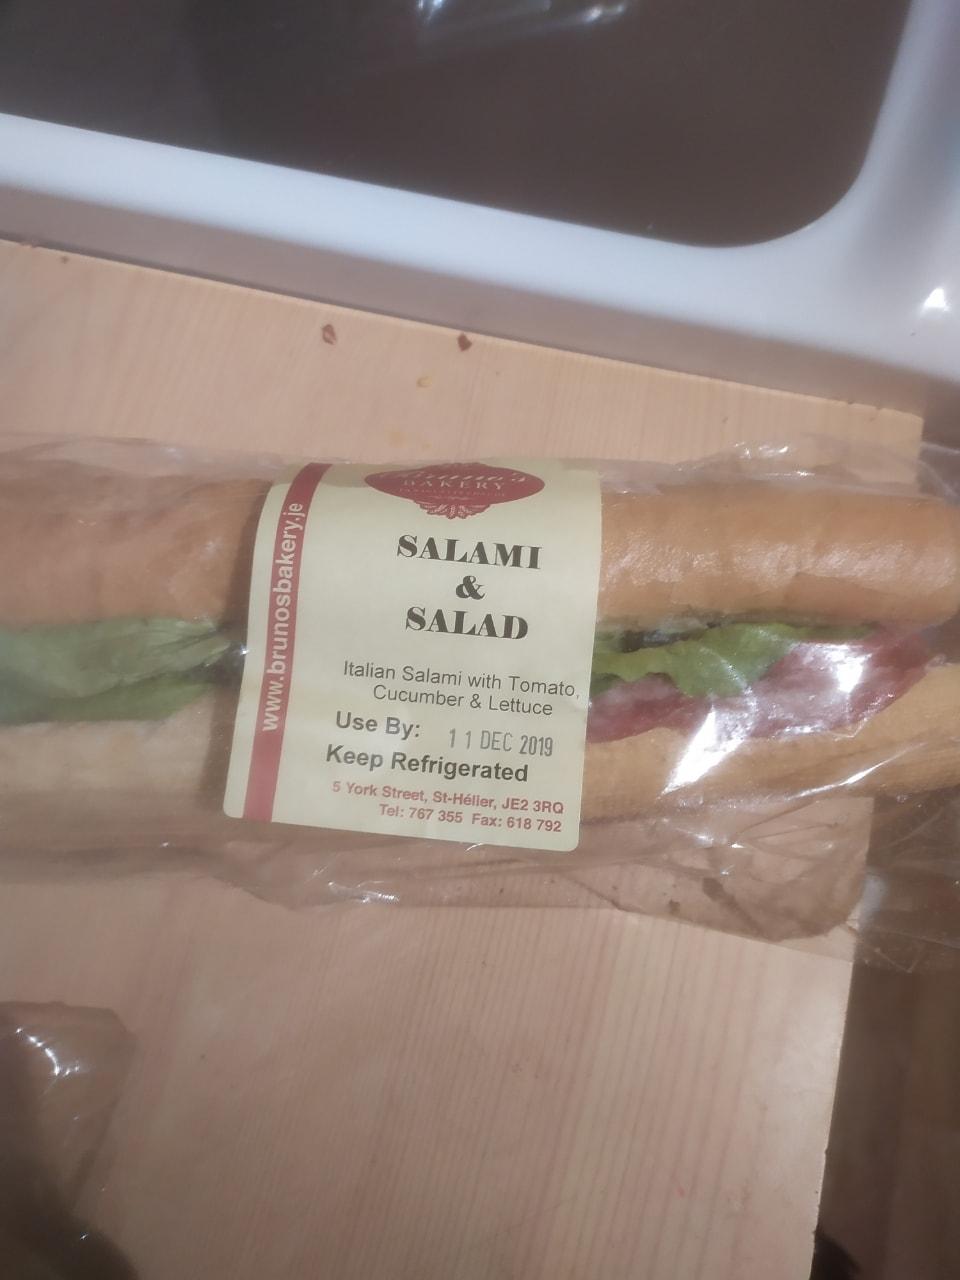 Salami and salad baguette